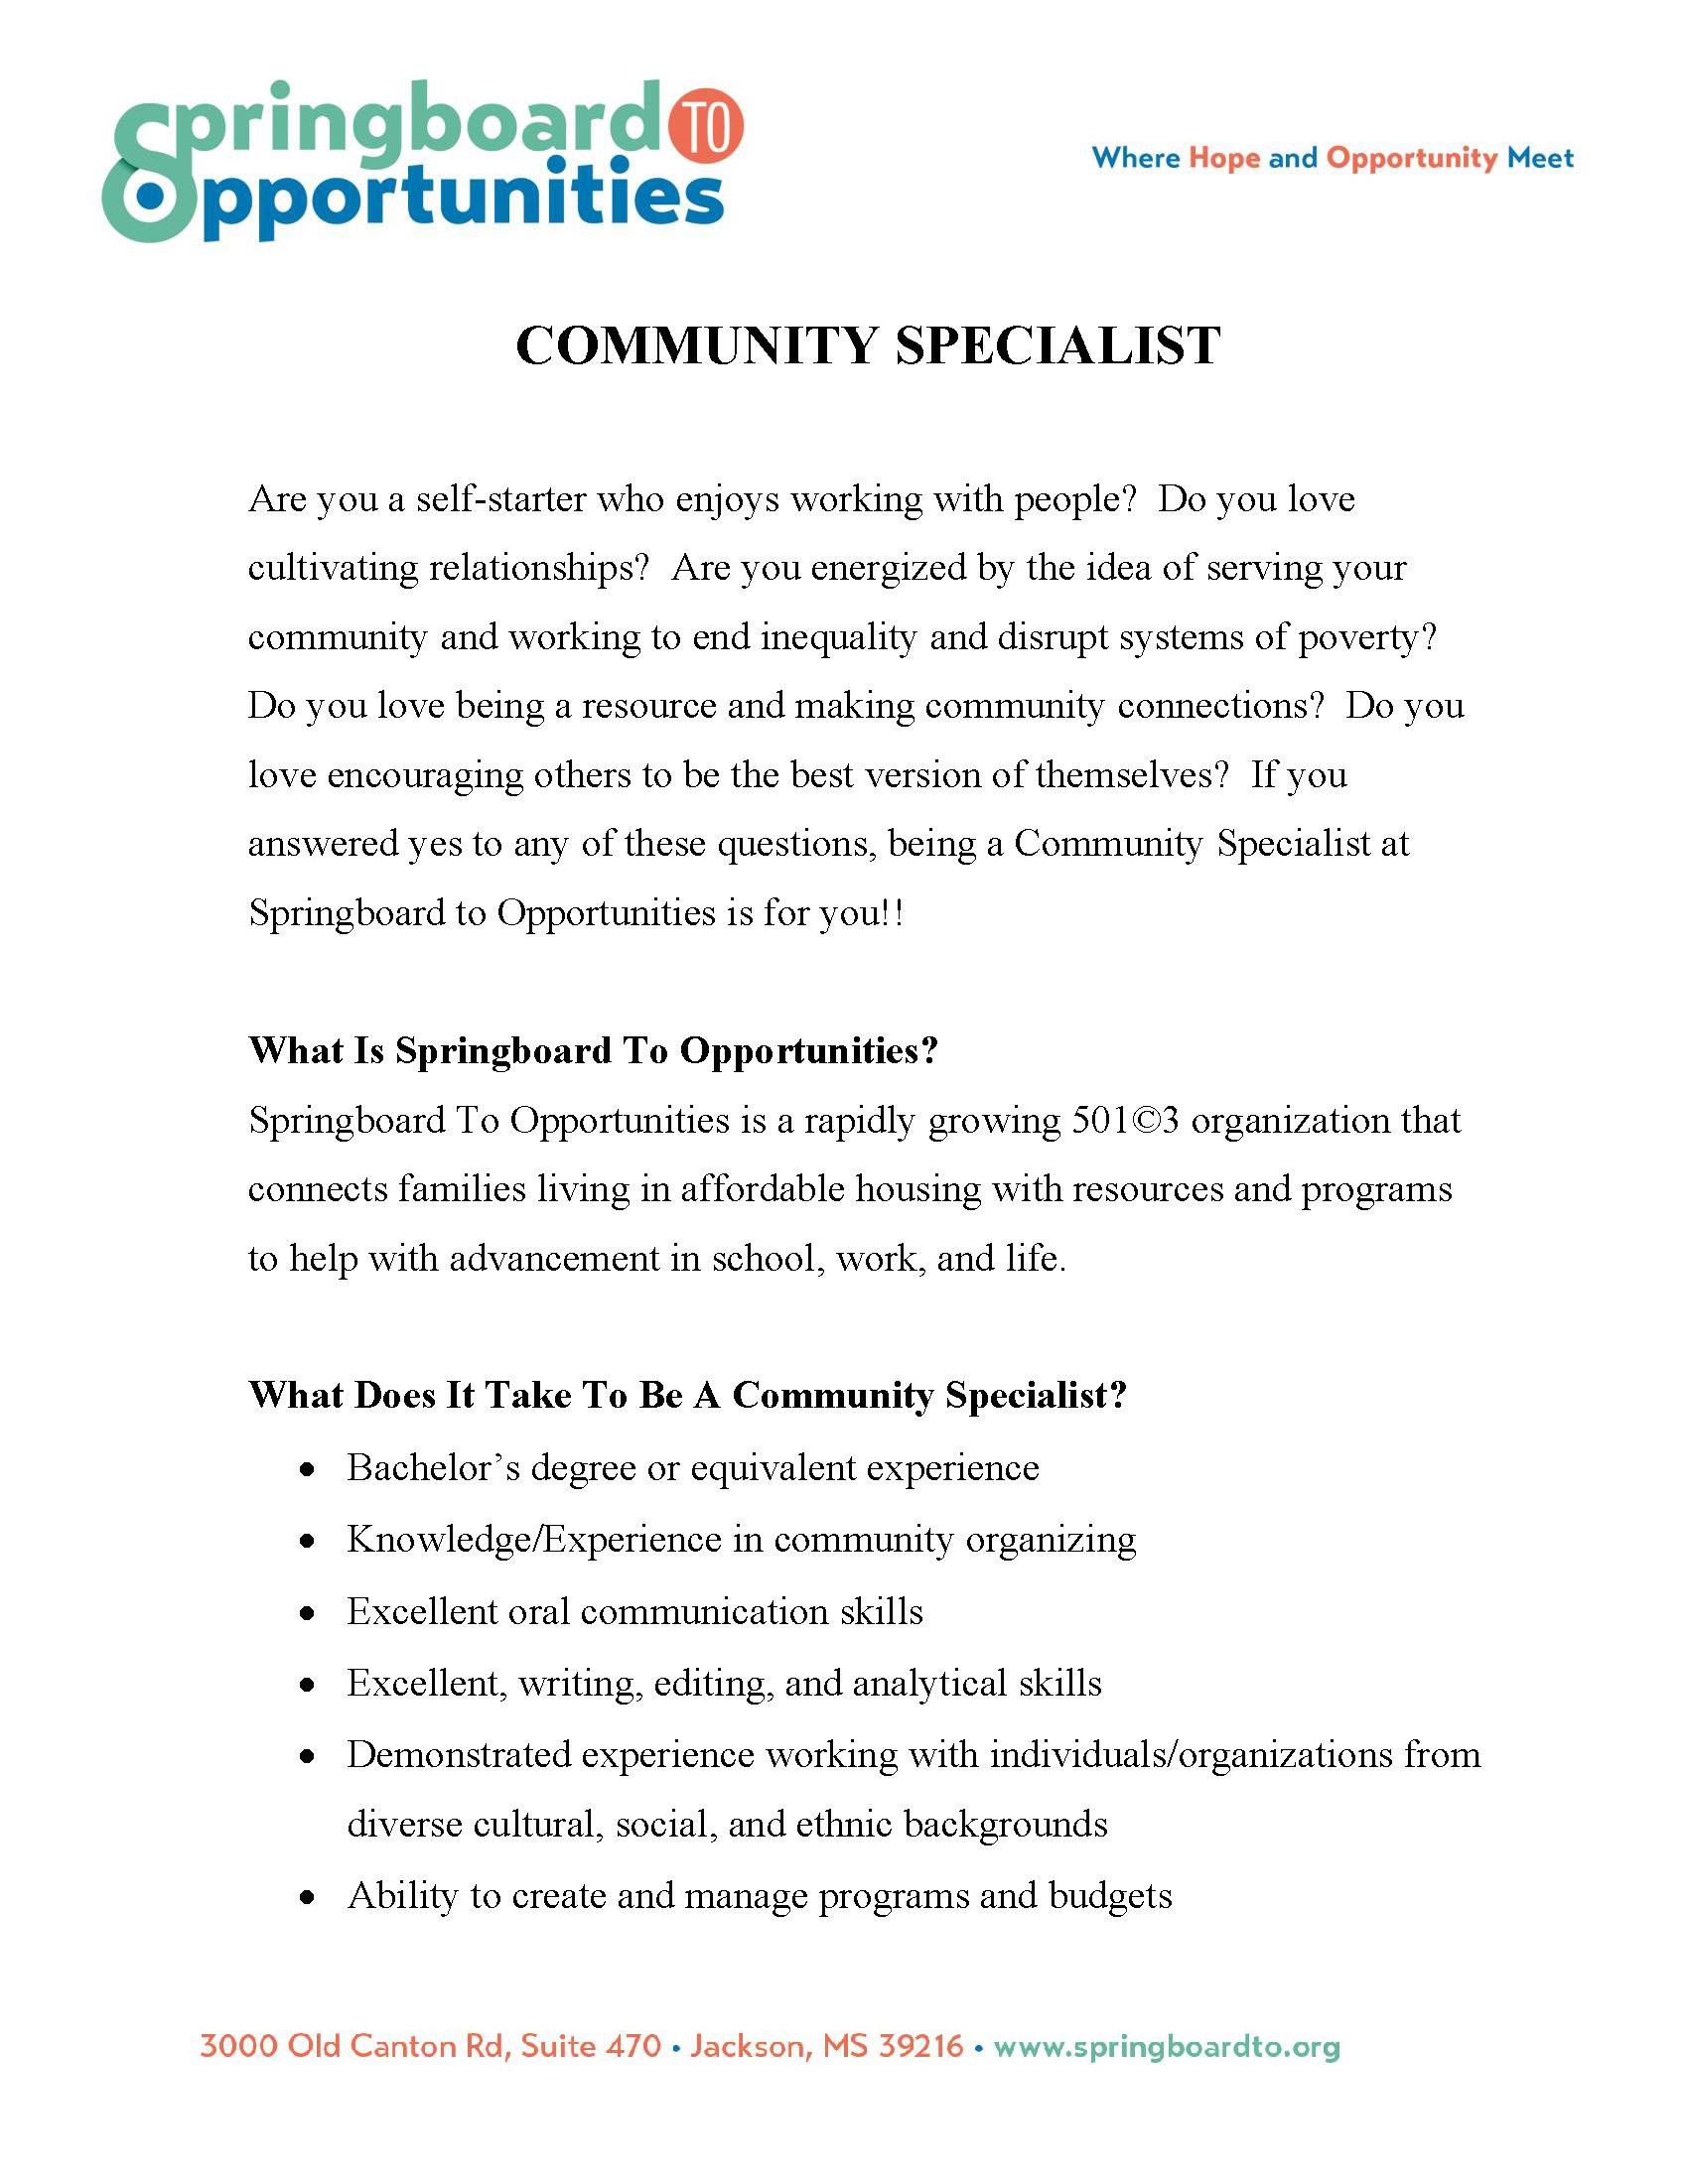 Community Specialist - Jackson